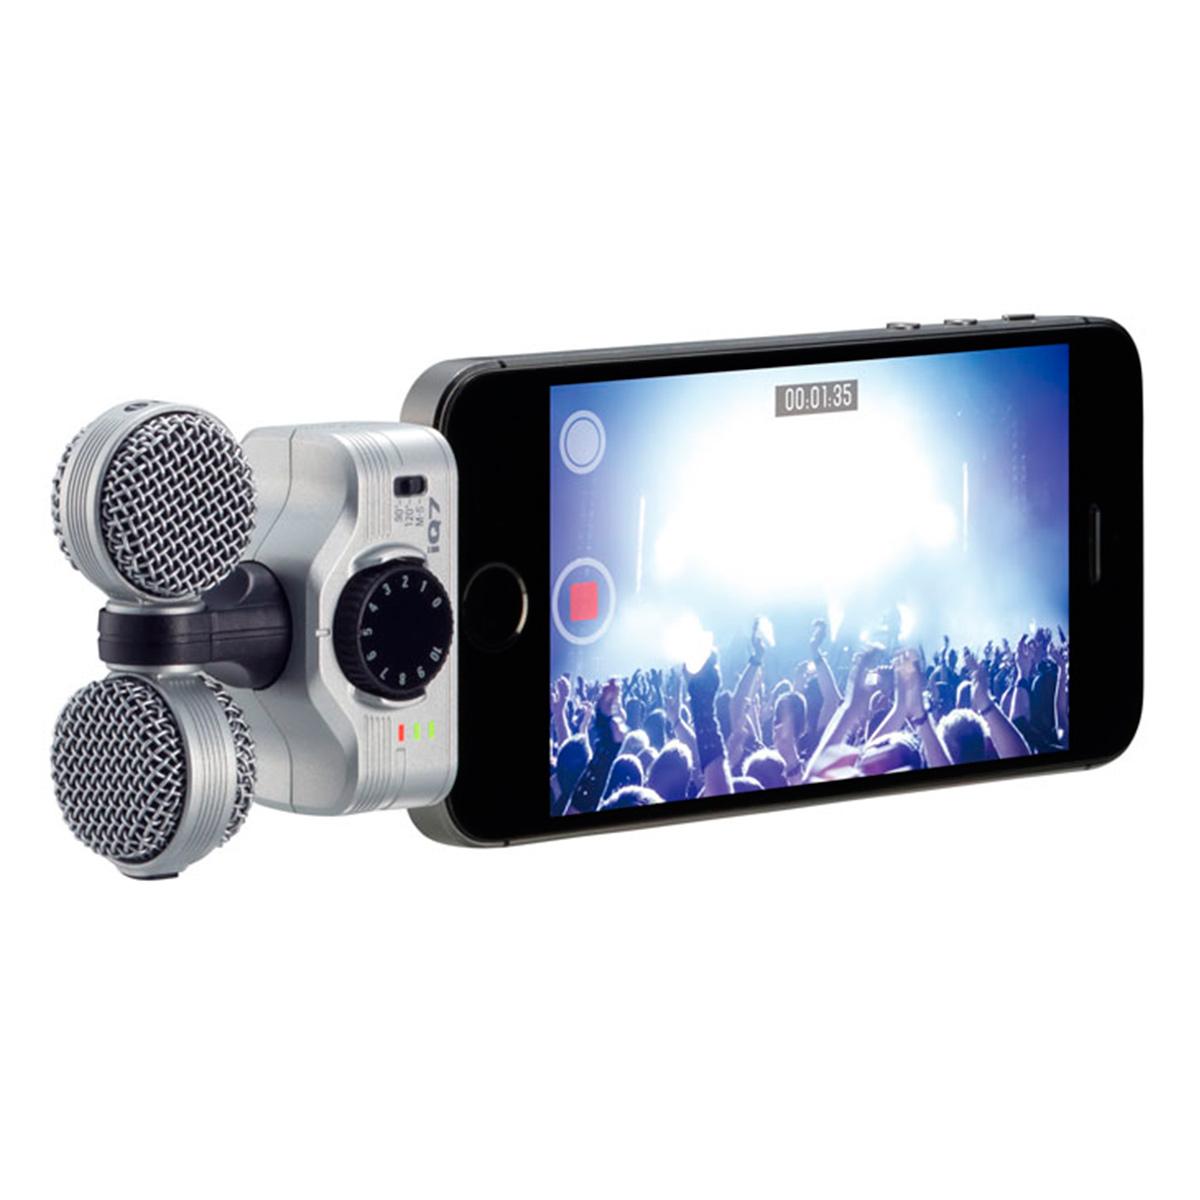 Microfone p/ iPhone e iPad iQ7 Zoom